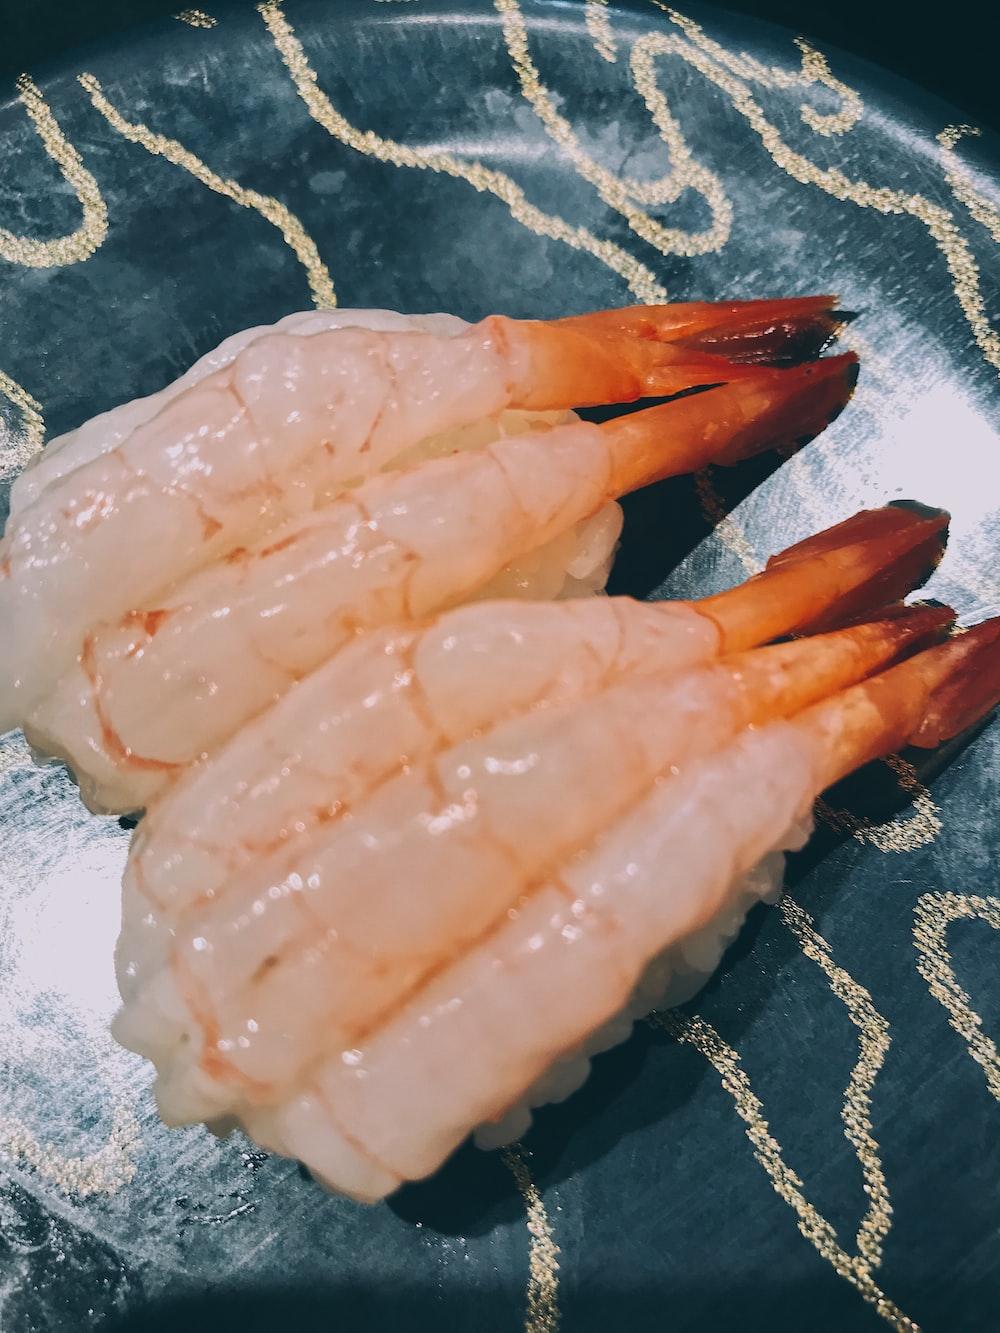 orange and white plastic gloves